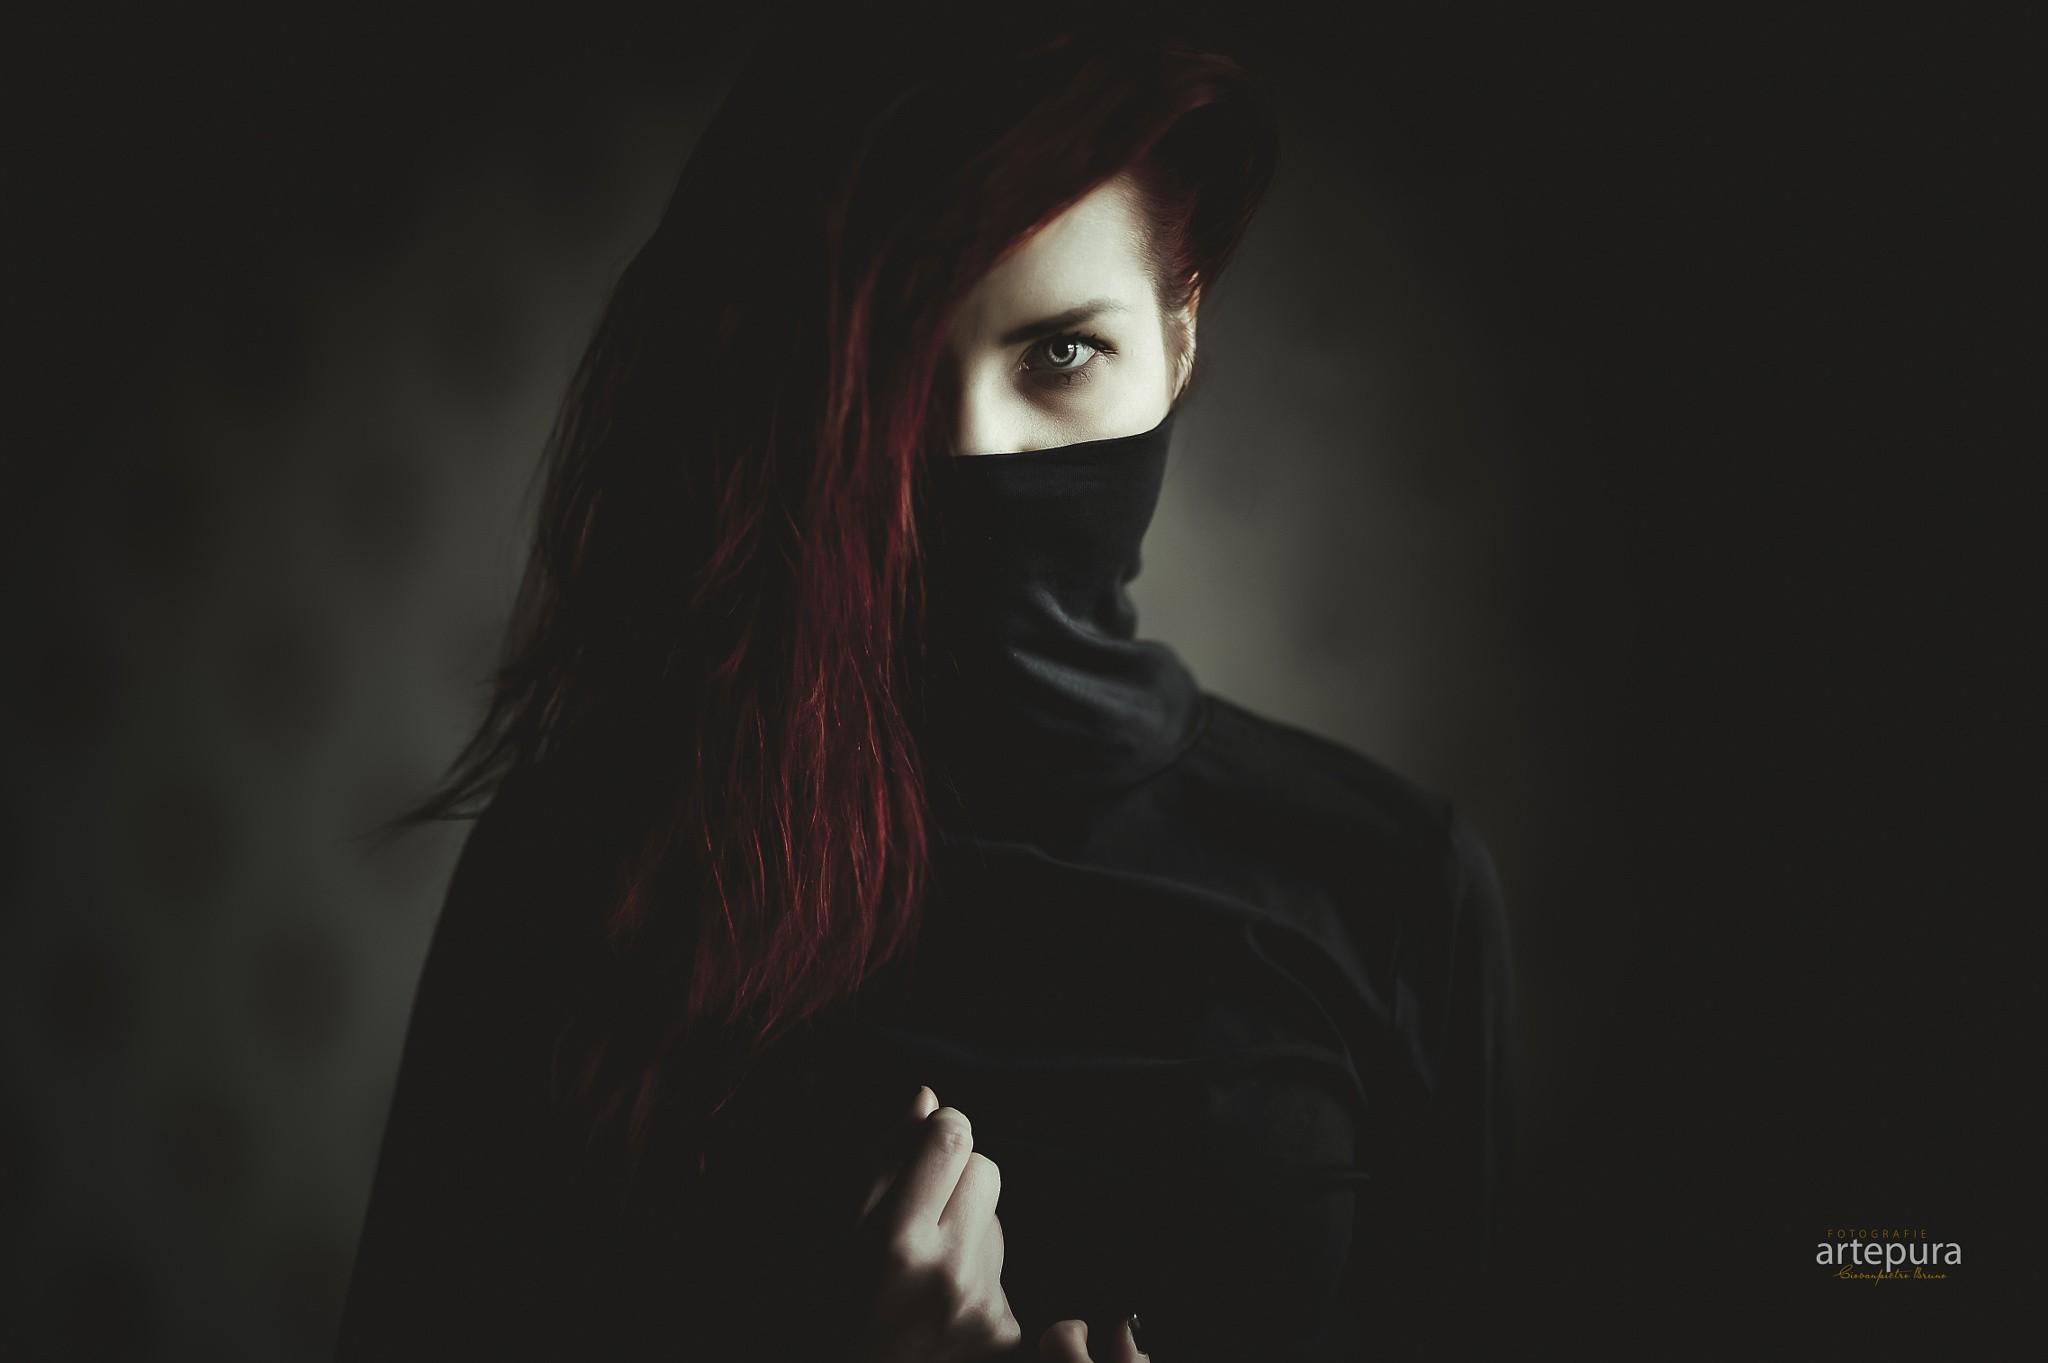 Emo Cartoon Girl Wallpapers Women Redhead Hazel Eyes Mask Portrait Black Clothing